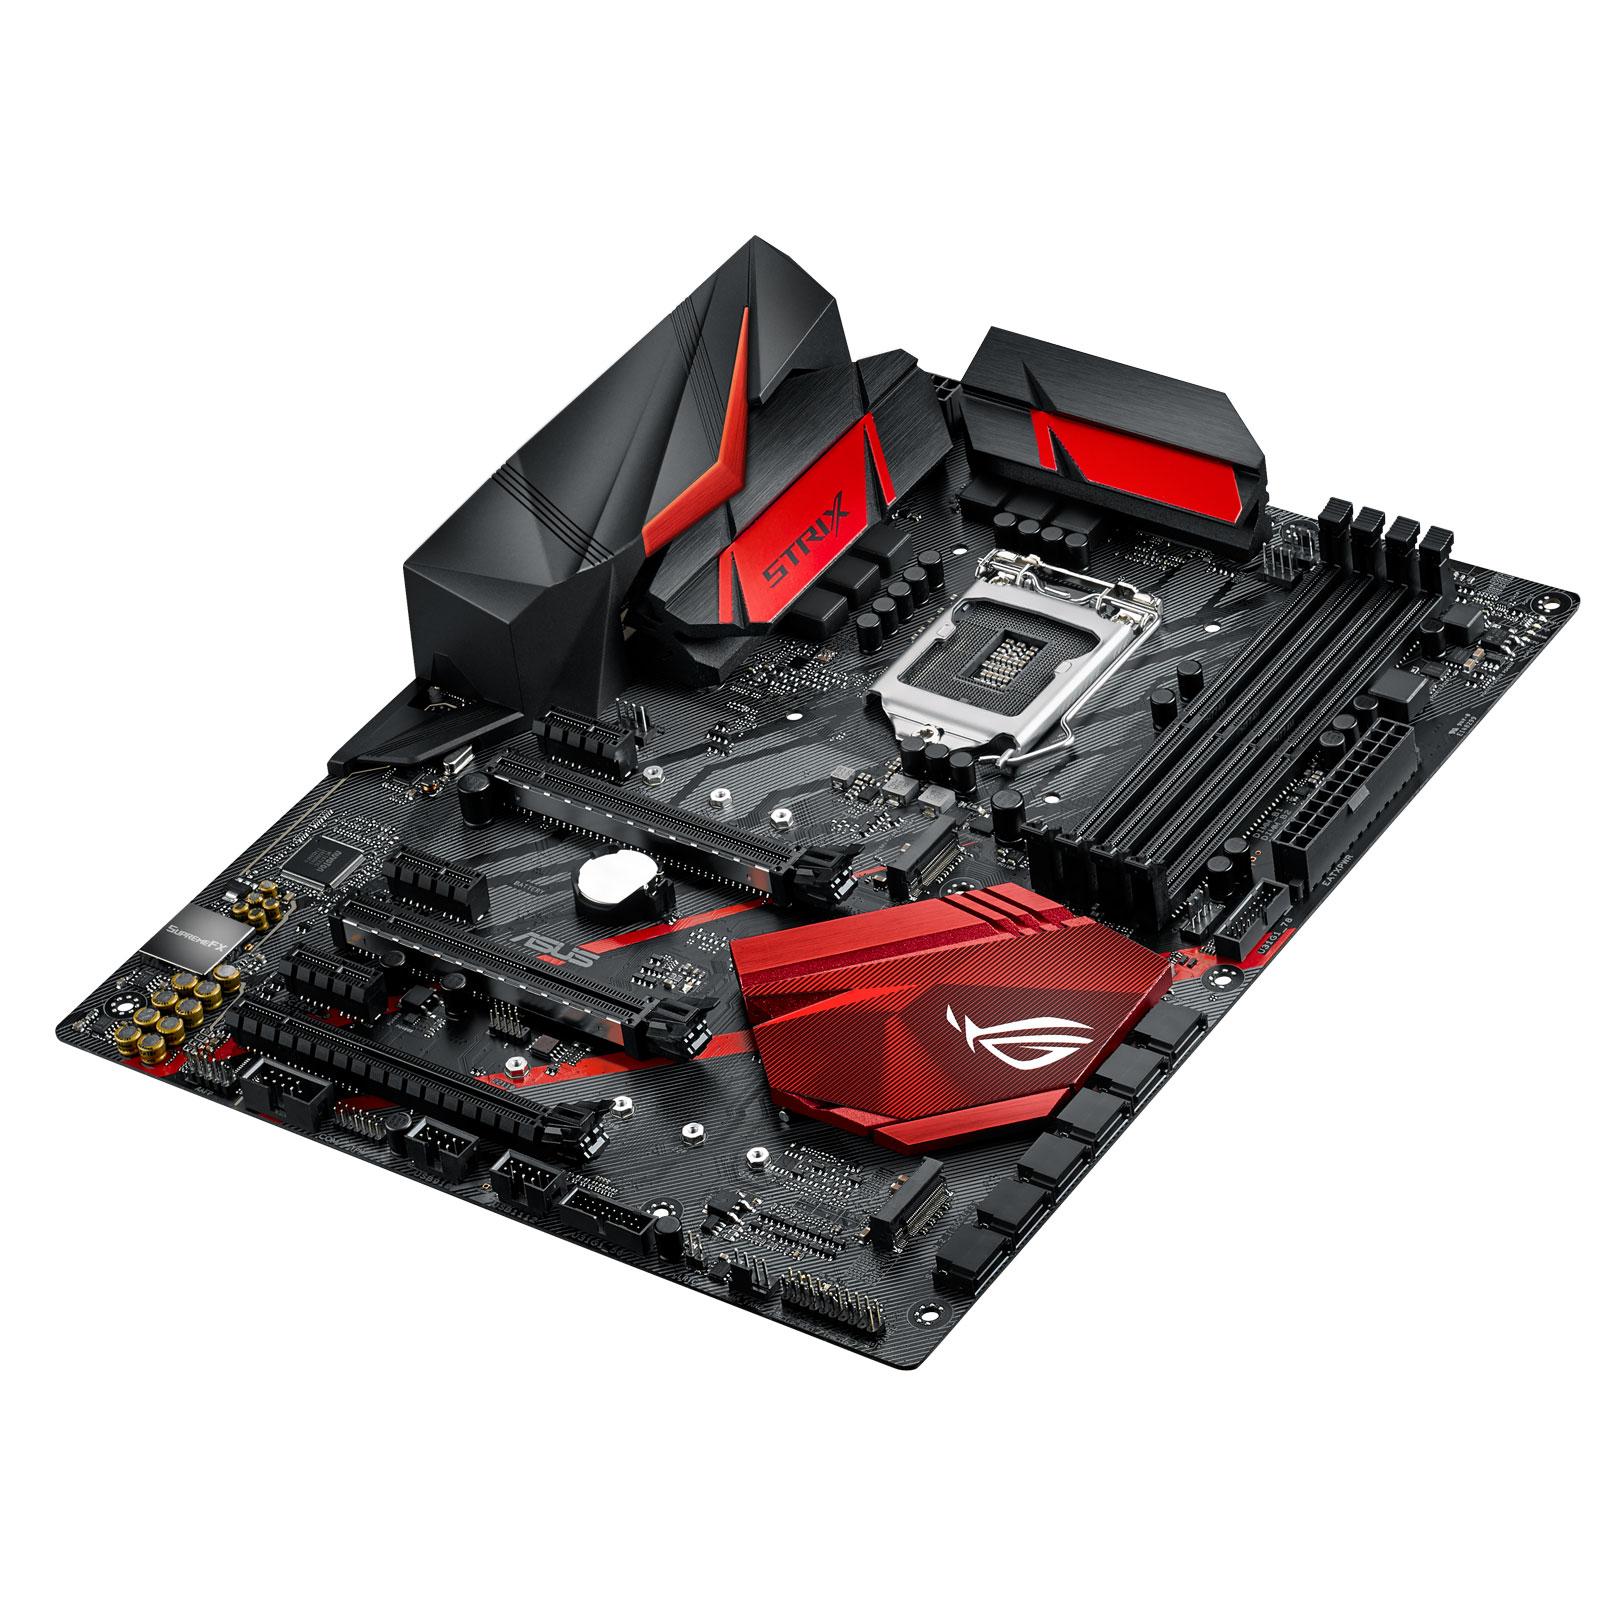 Carte mère ASUS ROG STRIX Z370-H GAMING Carte mère ATX Socket 1151 Intel Z370 Express - 4x DDR4 - SATA 6Gb/s + M.2 - USB 3.1 - 3x PCI-Express 3.0 16x